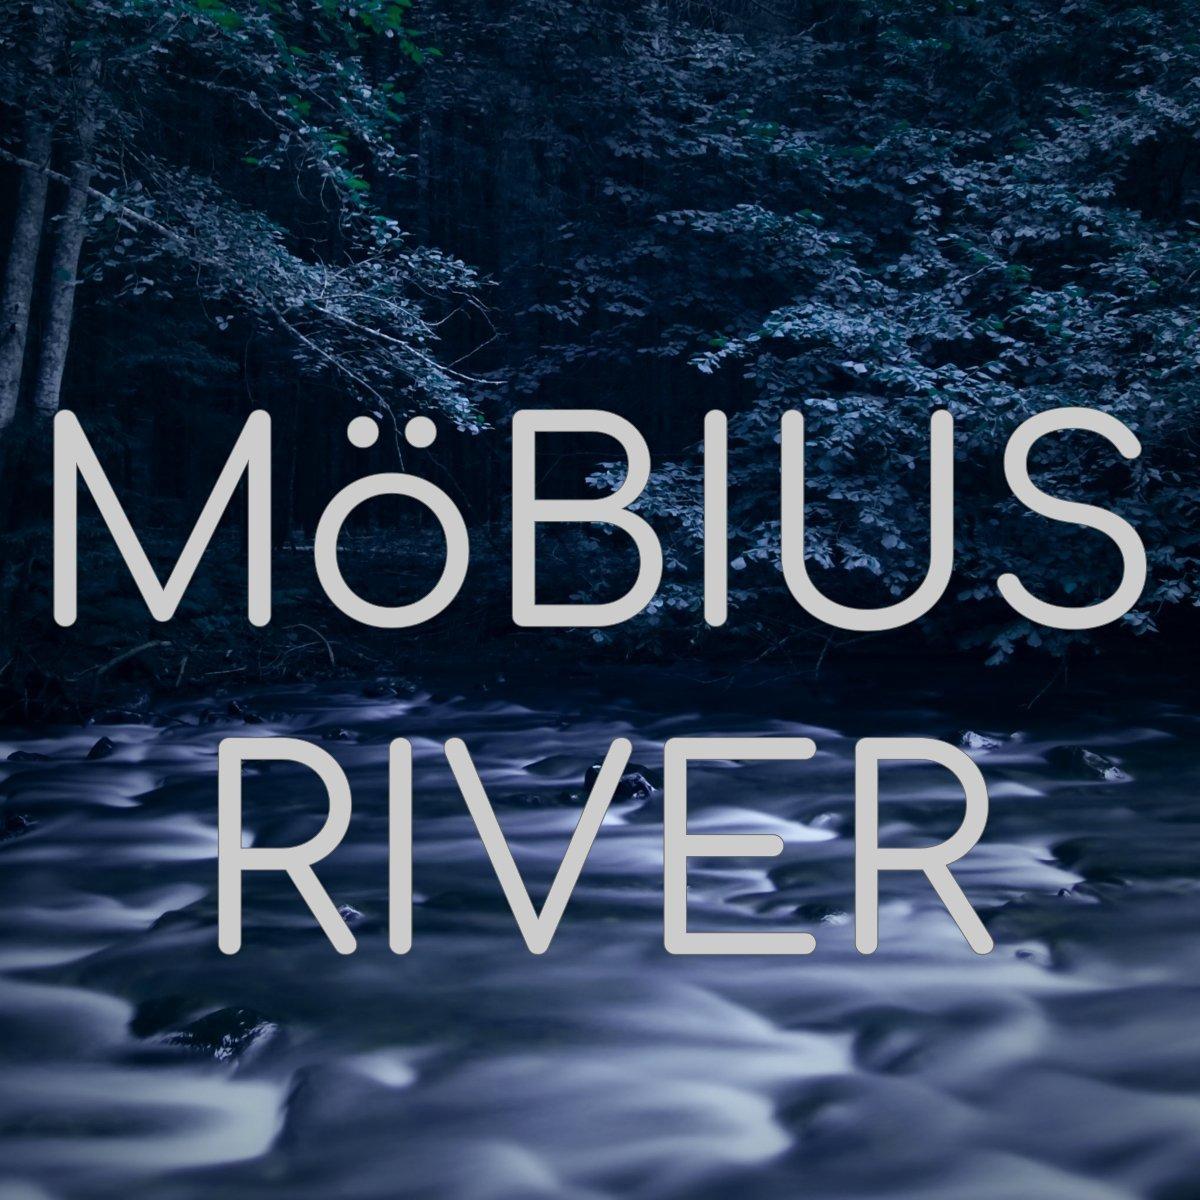 Mobius River - Short Film (@MobiusRiver)